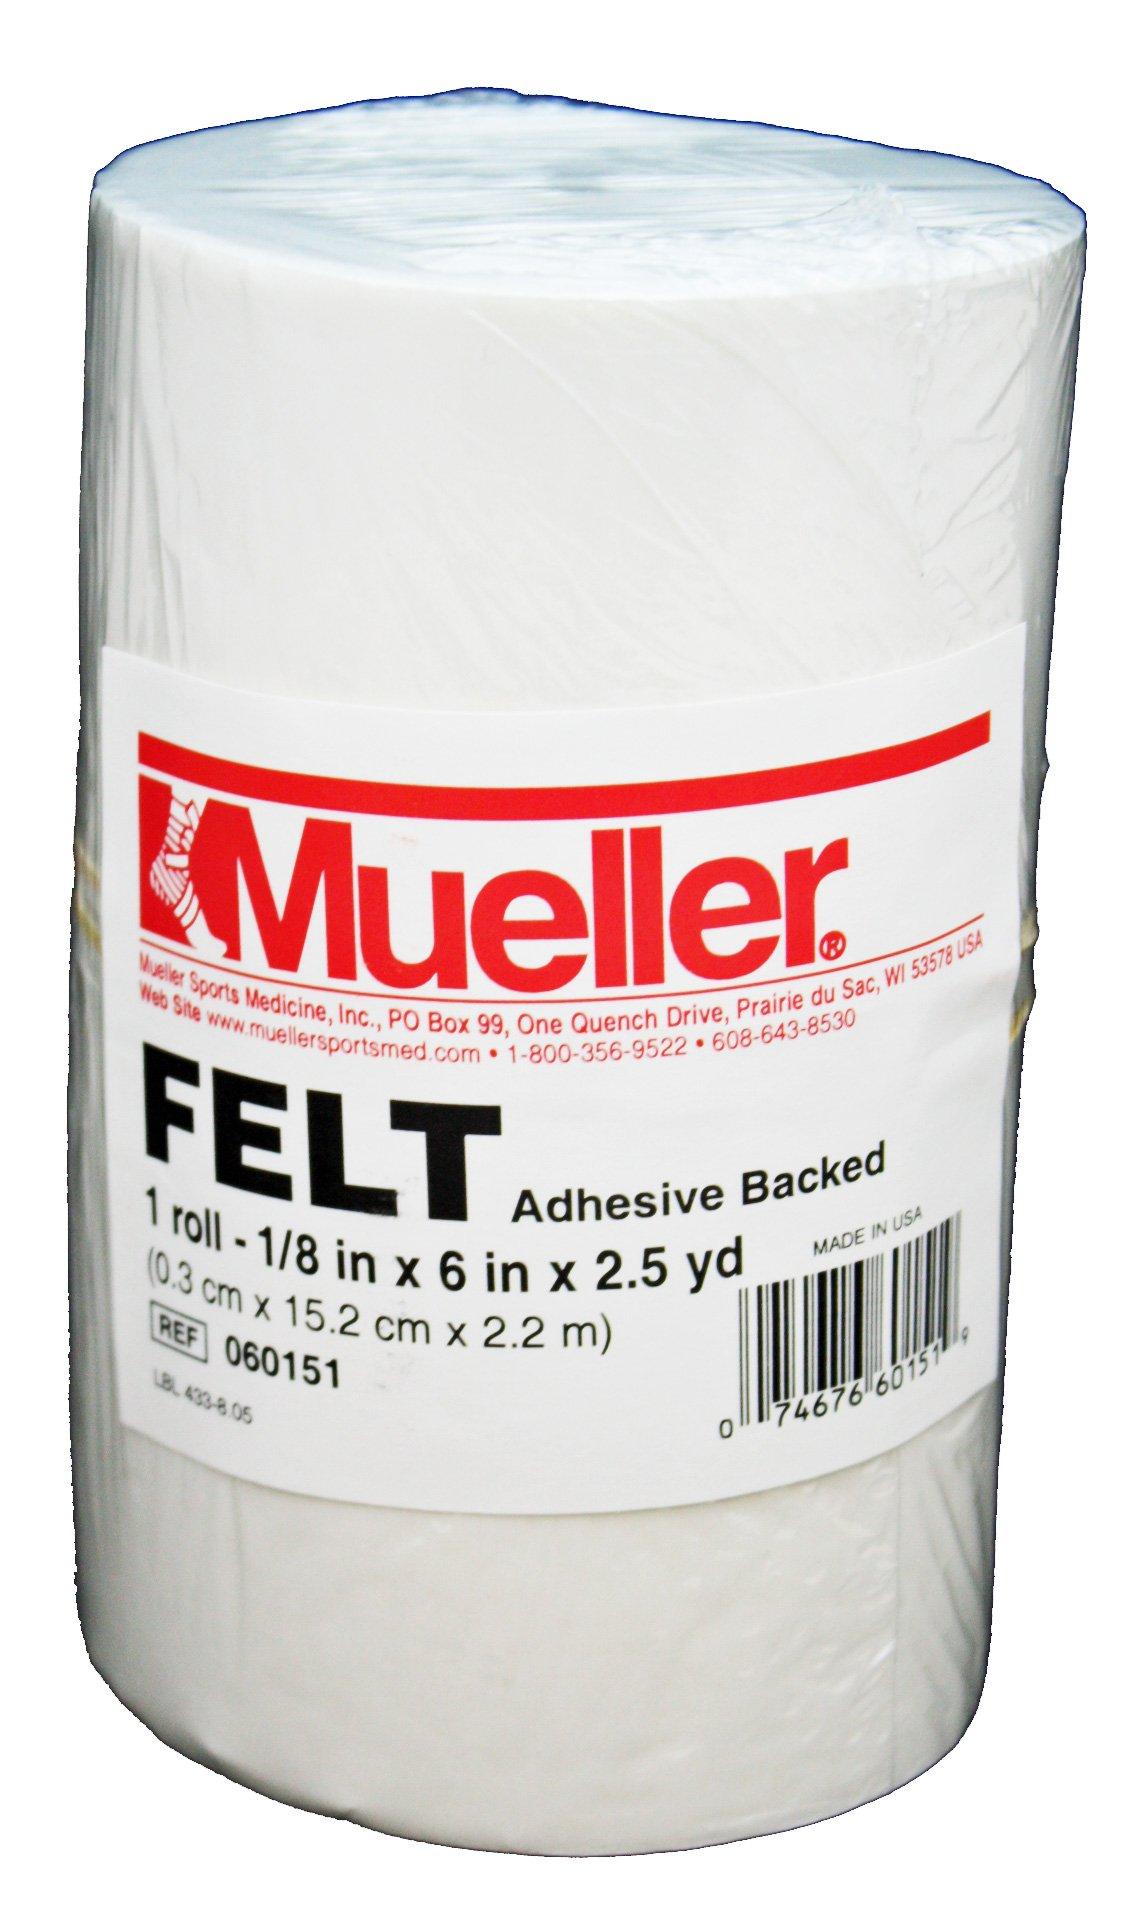 Mueller Orthopedic Felt - Adhesive backed - 1/8'' x 6'' x 2.5 yd roll